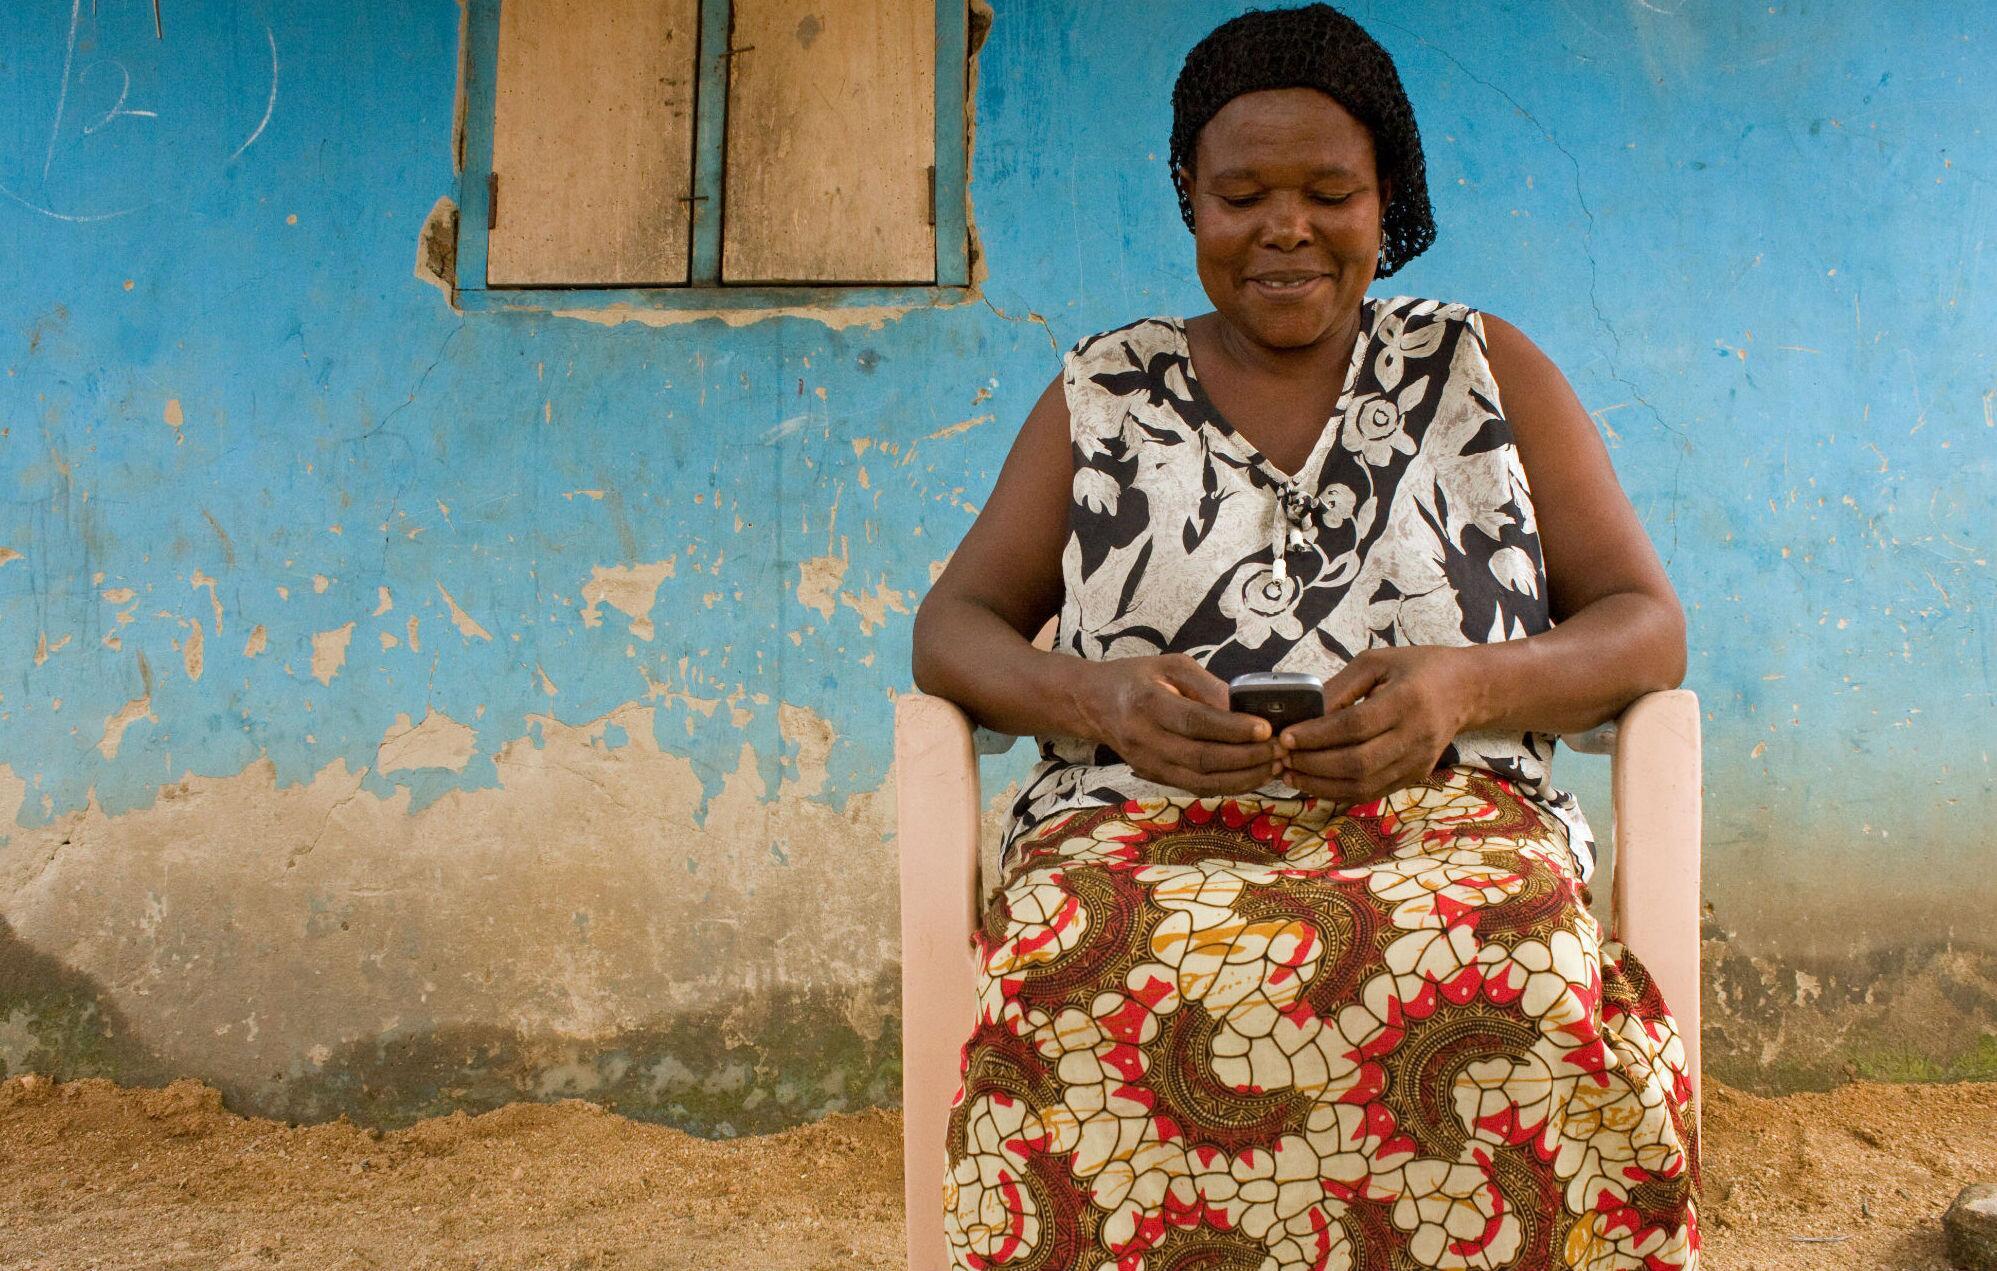 Bild zu UNICEF, WhatsApp Stiftung United Internet for UNICEF